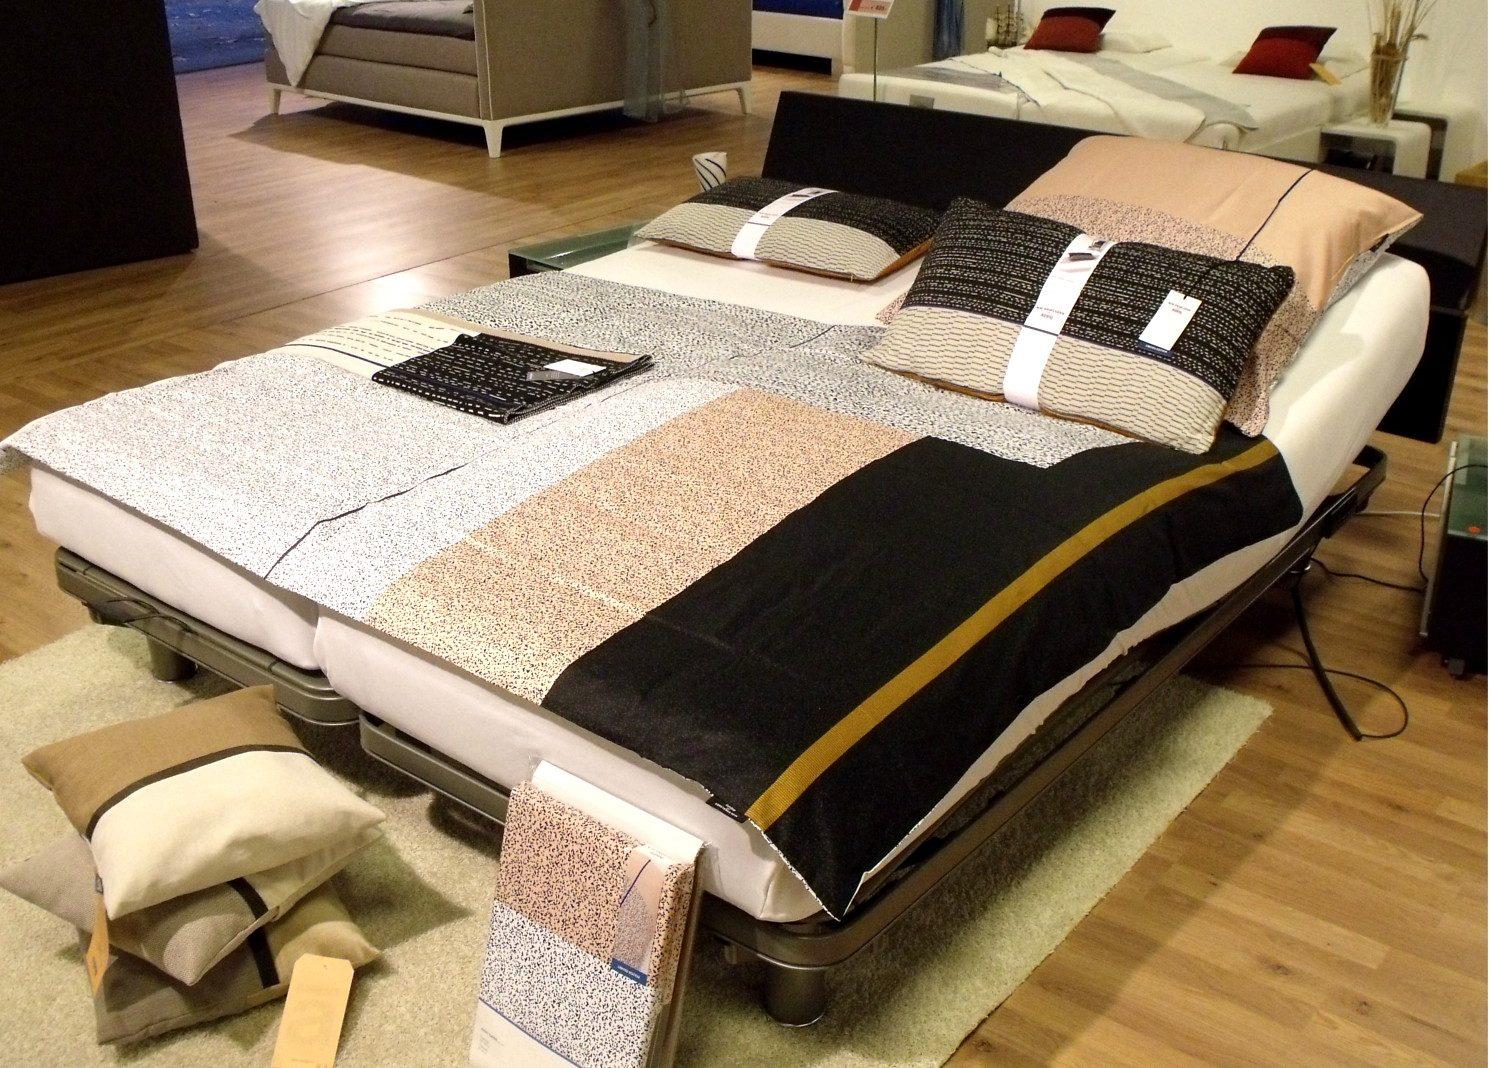 Full Size of Netzrahmen Nah Dulle Komfortbetten Bett Betten.de